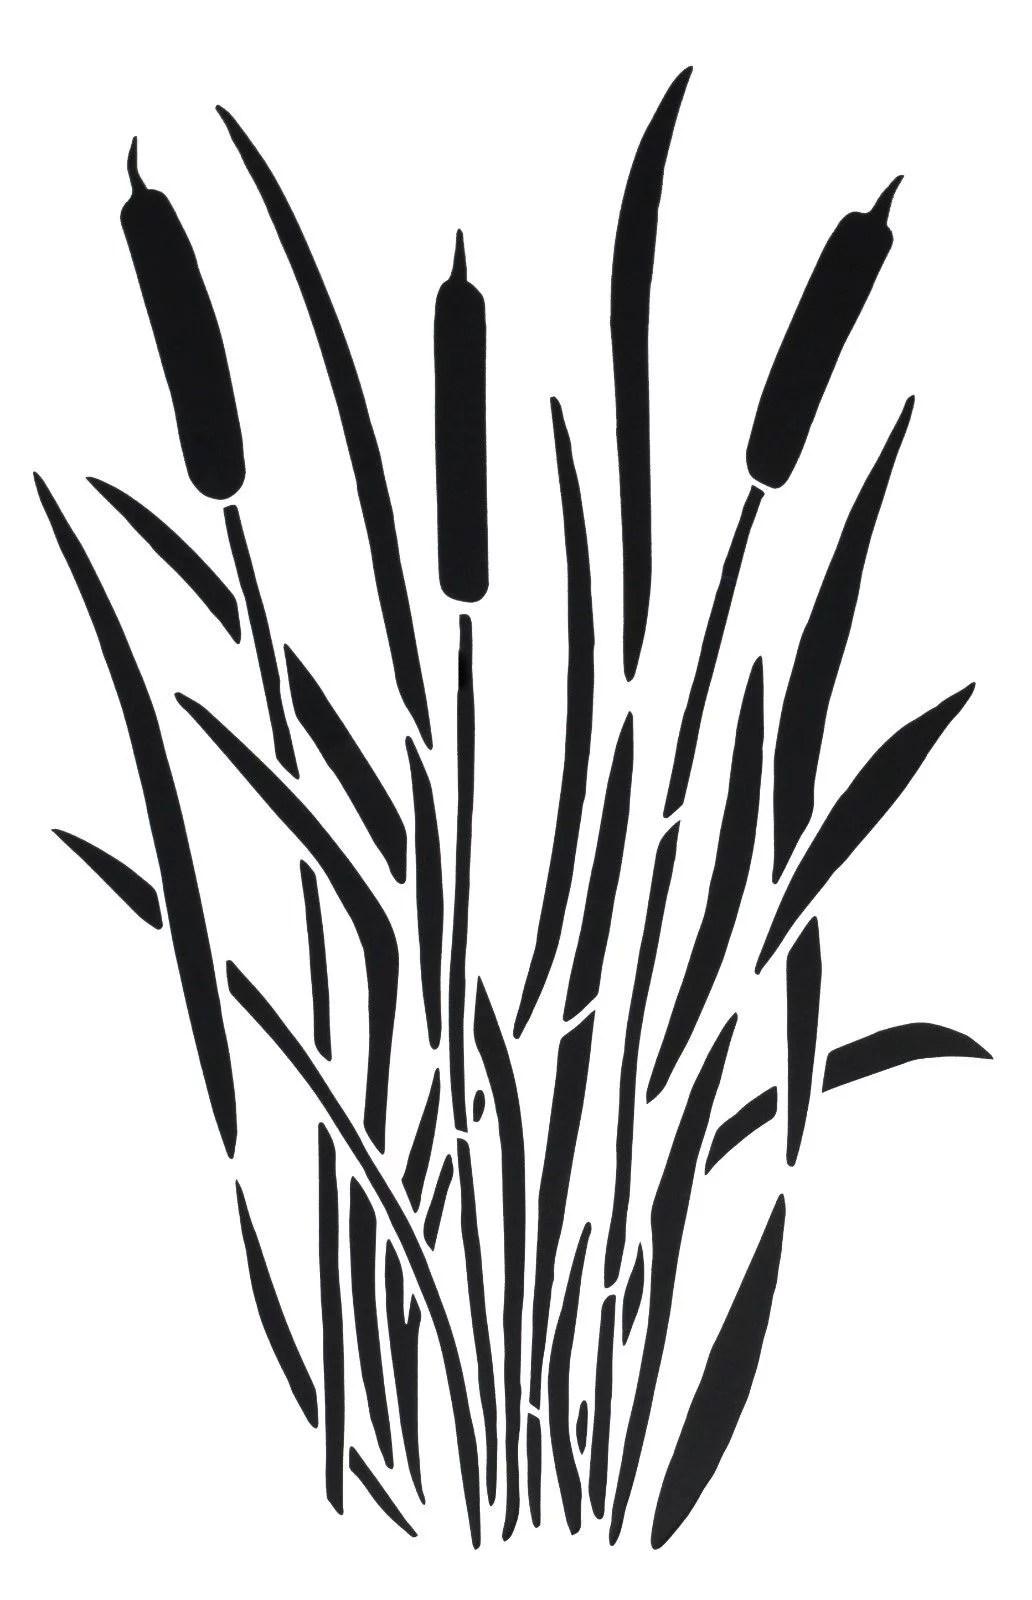 Geeky Printable Camo Stencil